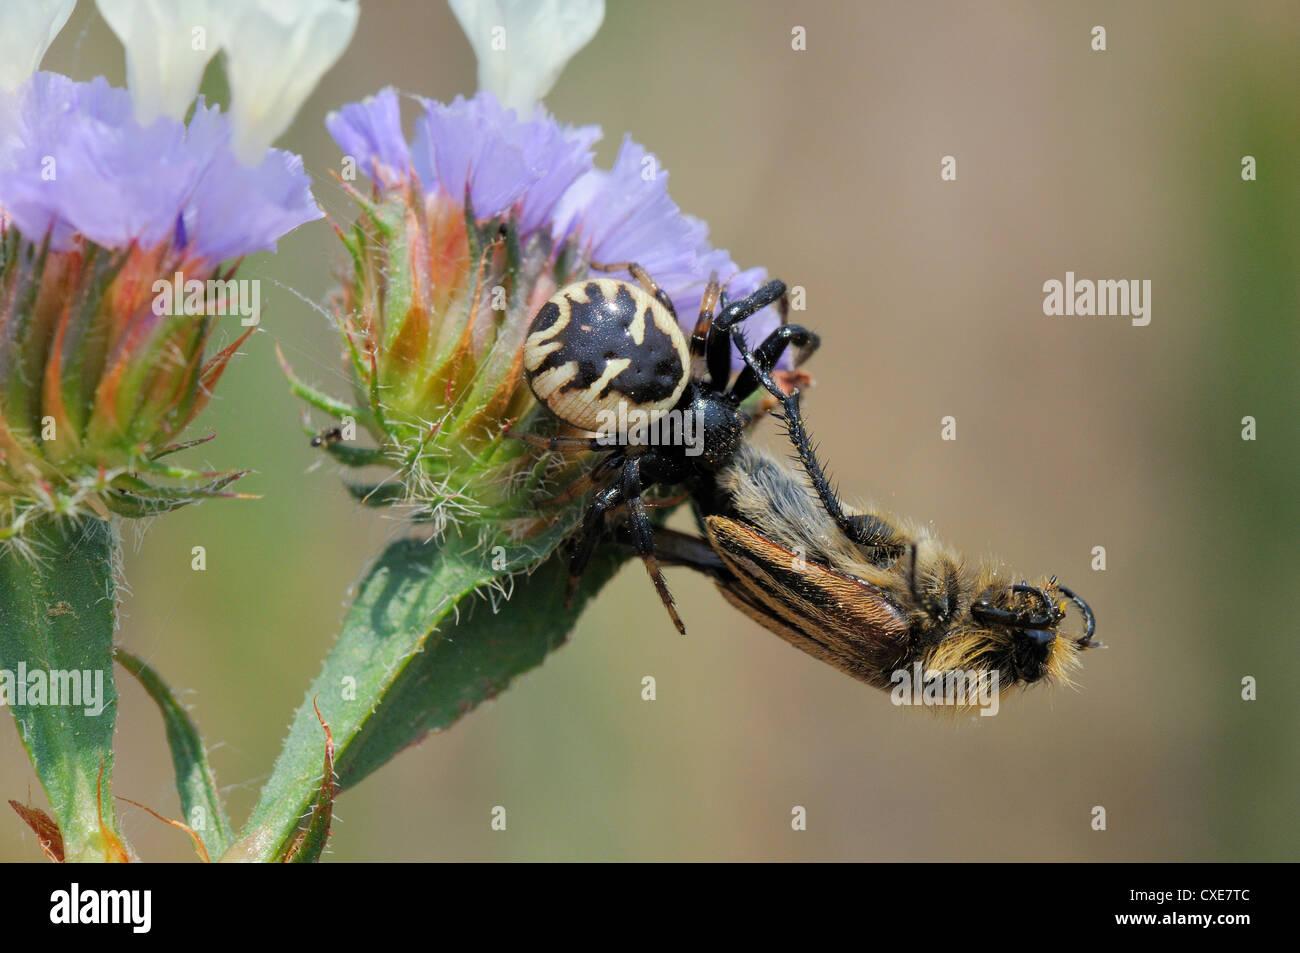 Krabben Sie-Spinne (Synema Globosum) mit Hummel, Hummel, Biene Skarabäus-Käfer (Eulasia Vittata) Beute, Stockbild